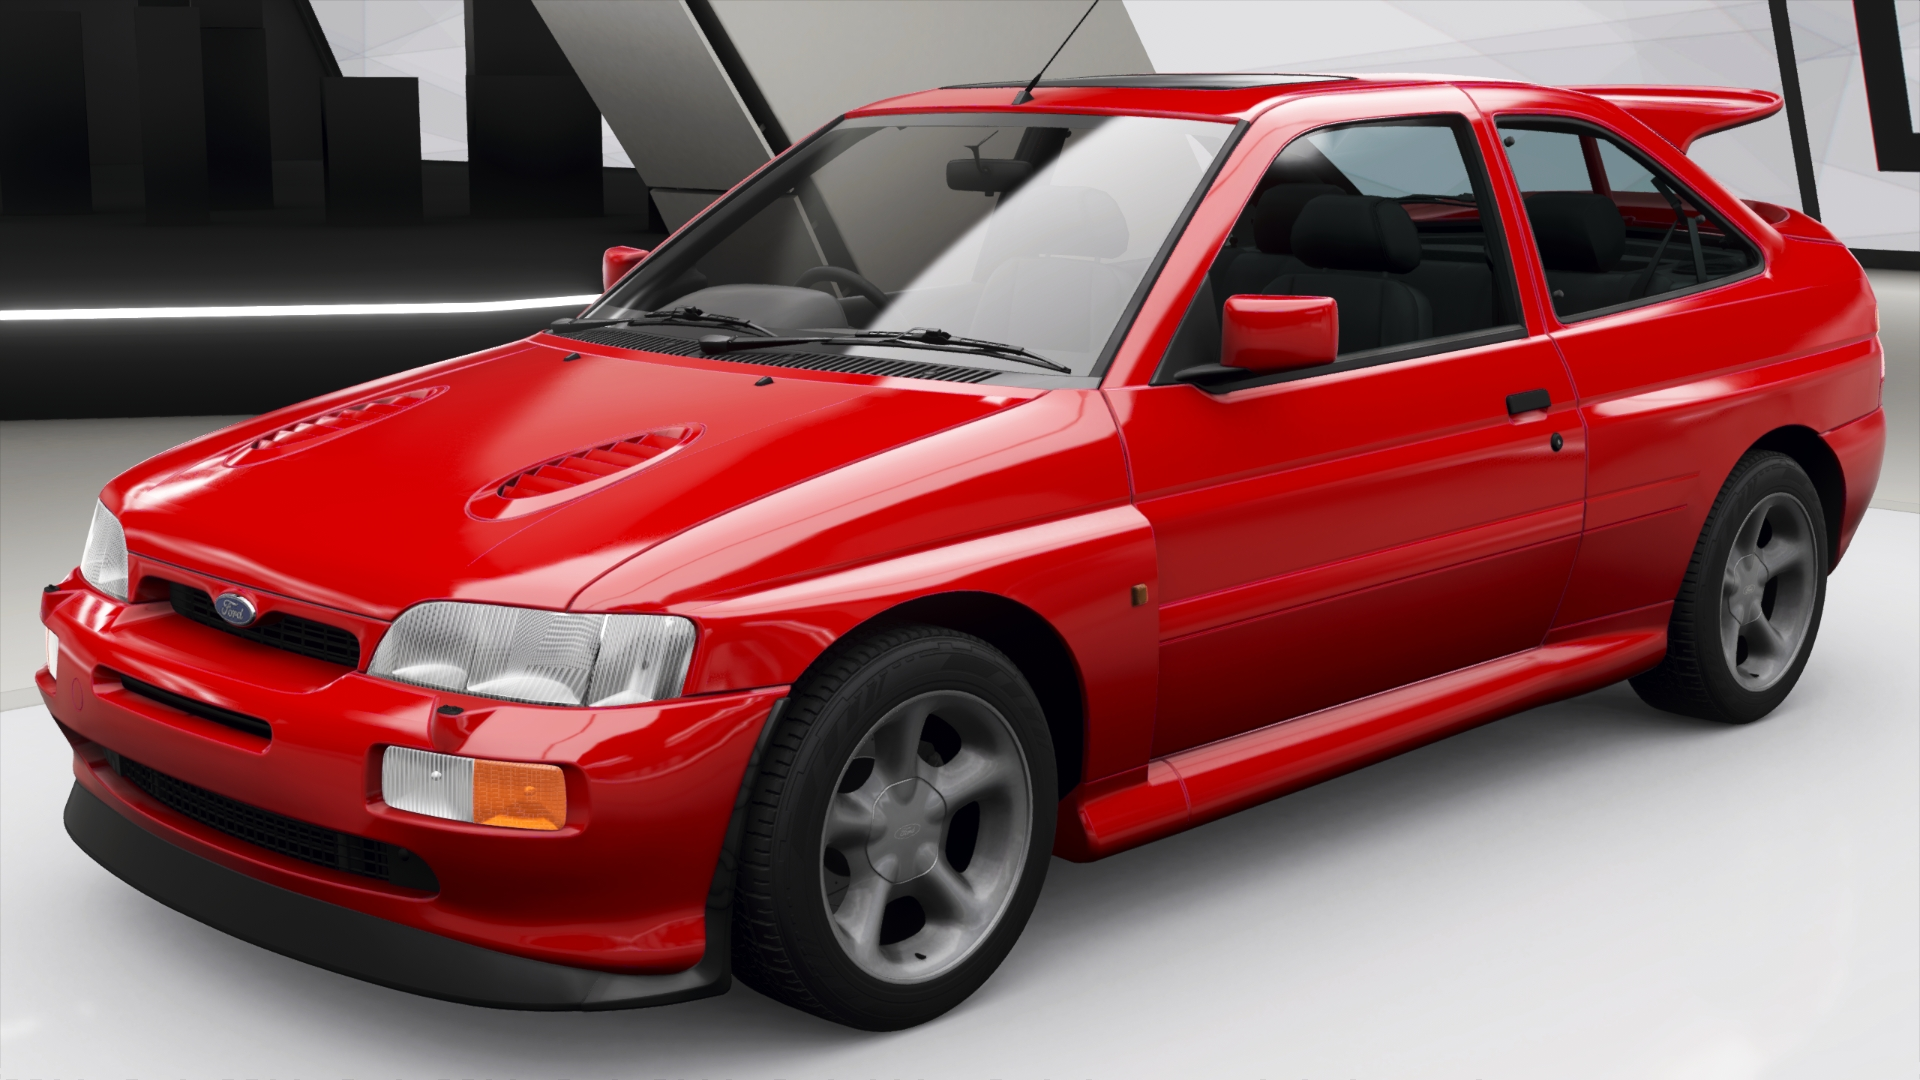 Ford Escort RS Cosworth | Forza Motorsport Wiki | FANDOM